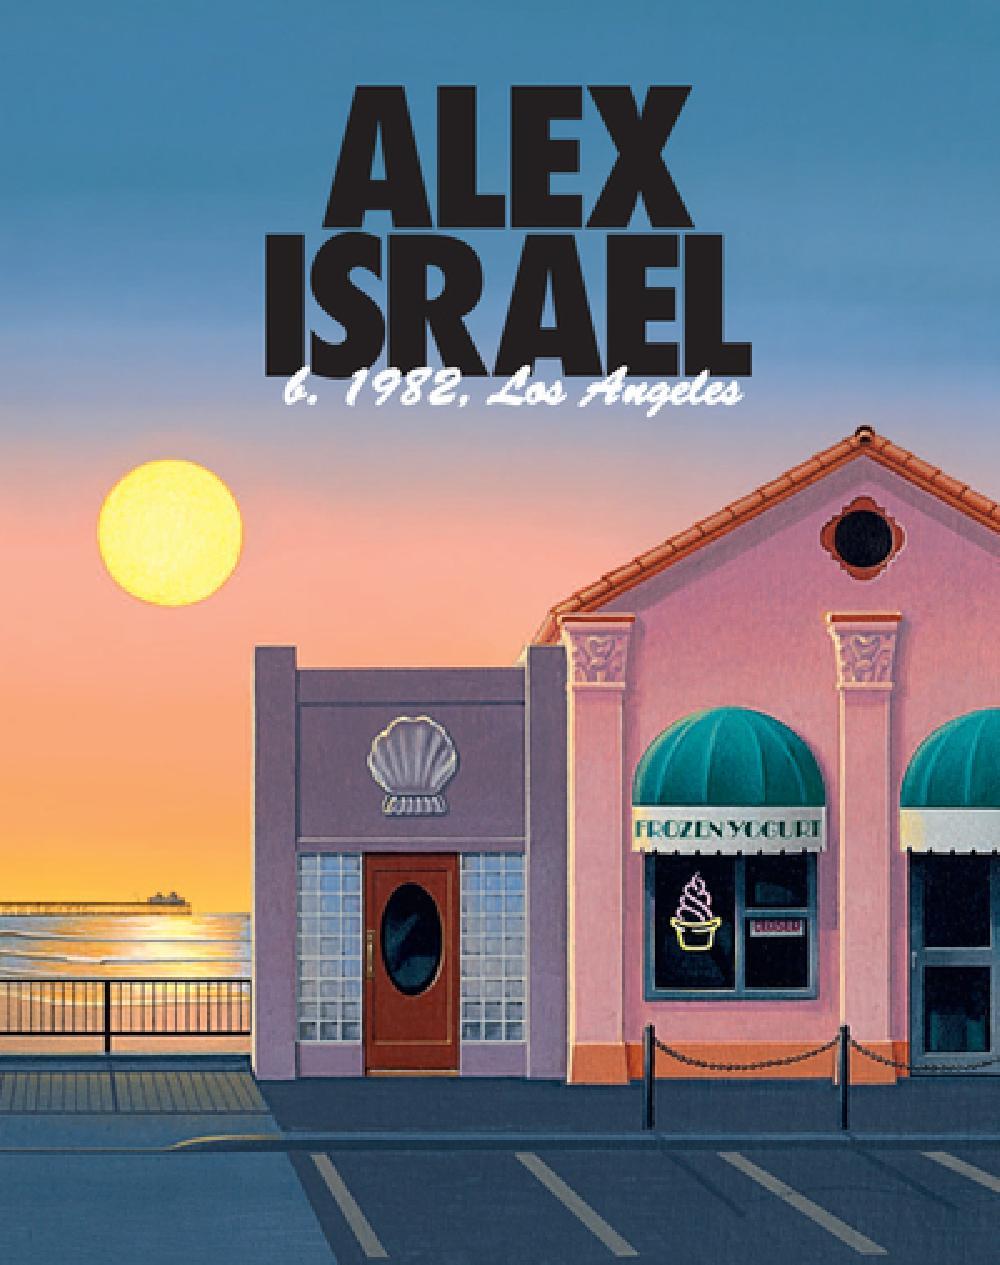 Alex Israel b. 1982, Los Angeles